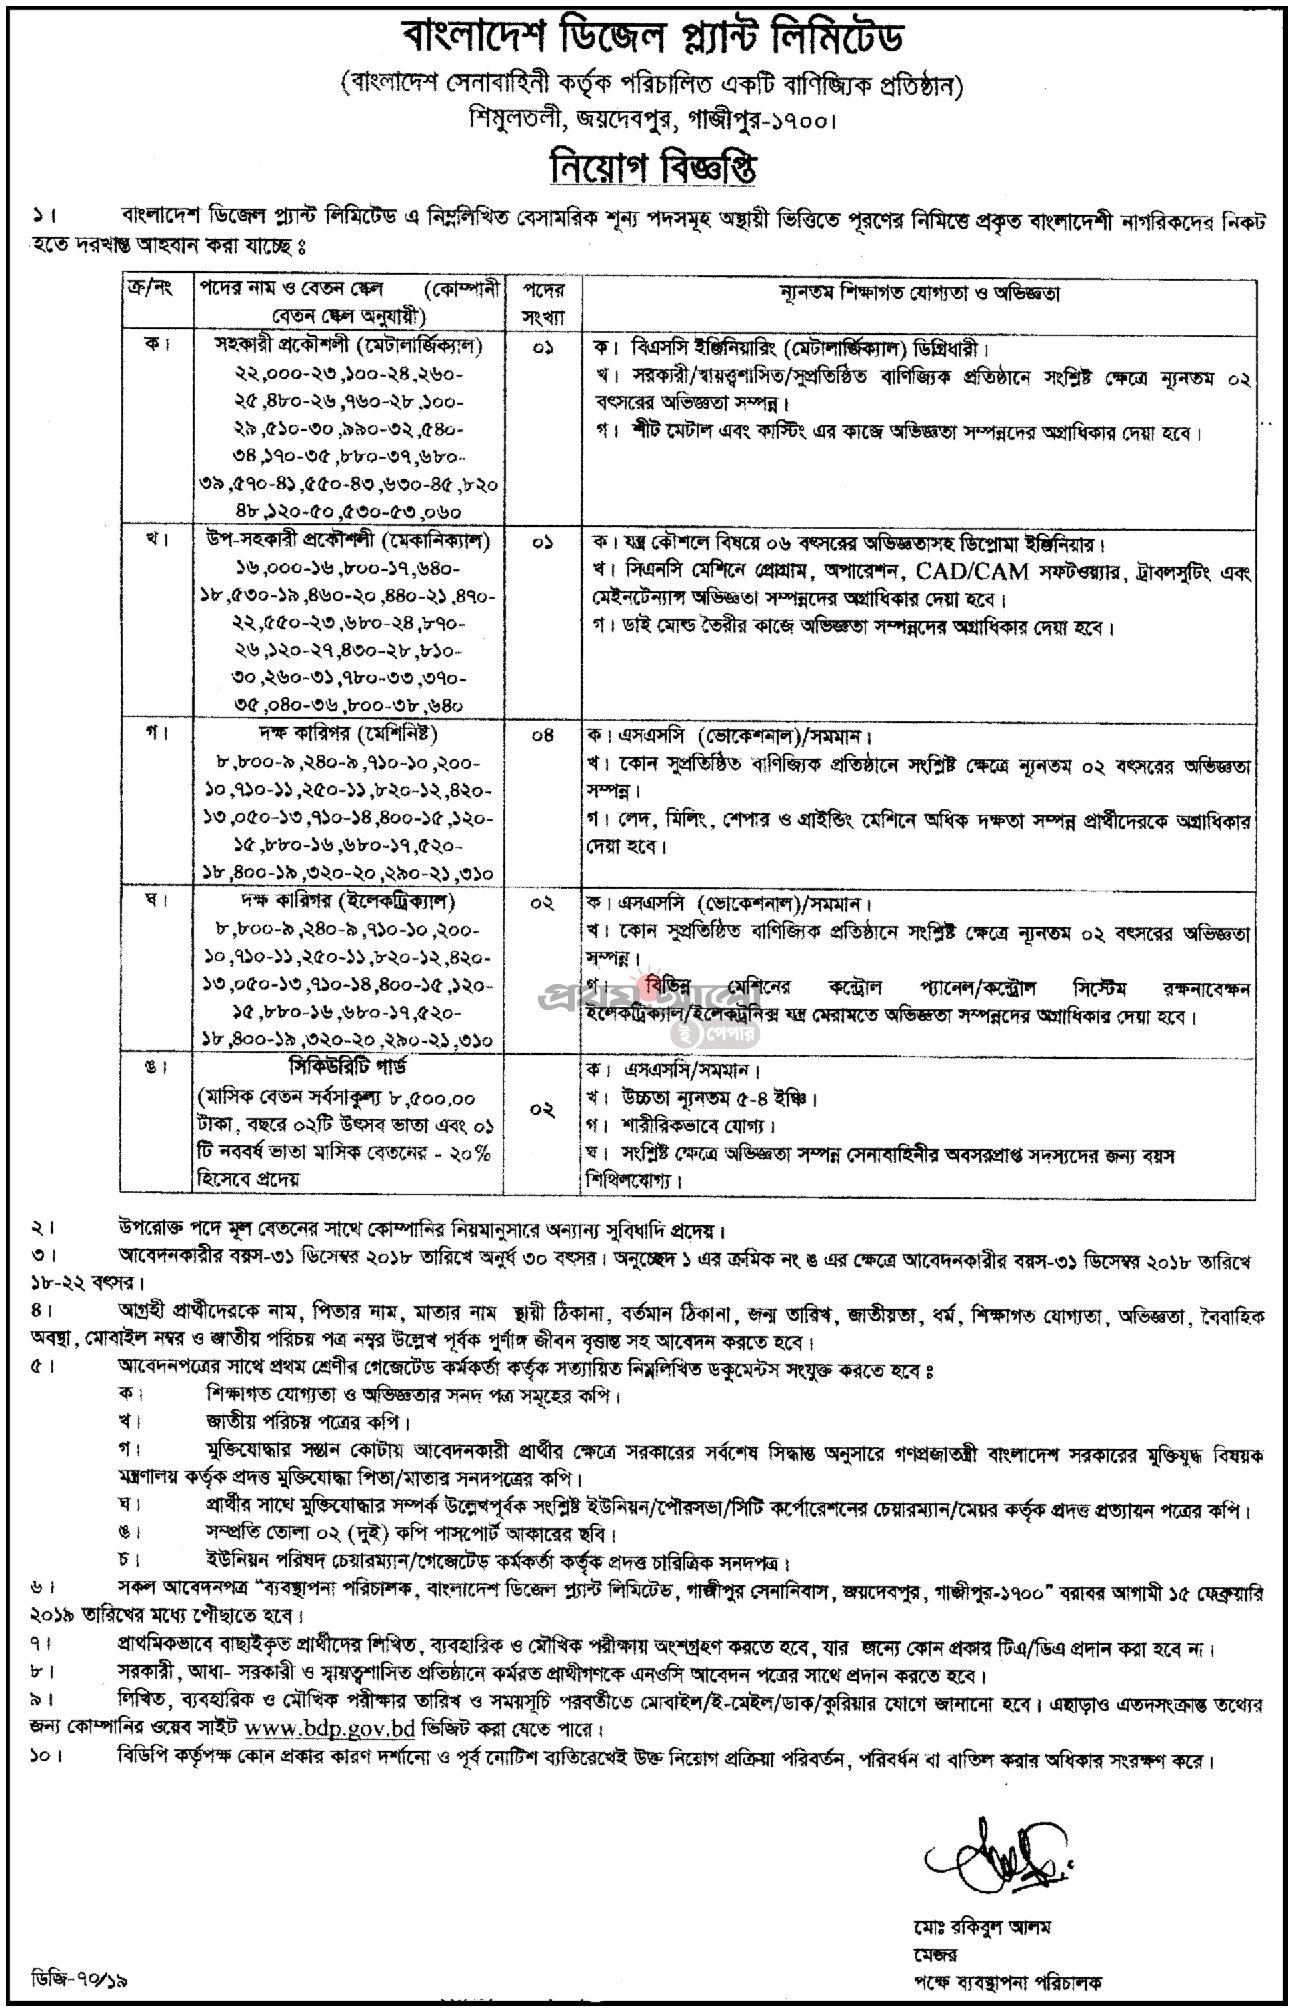 Bangladesh Diesel Plant bdp Limited Job Circular 2019